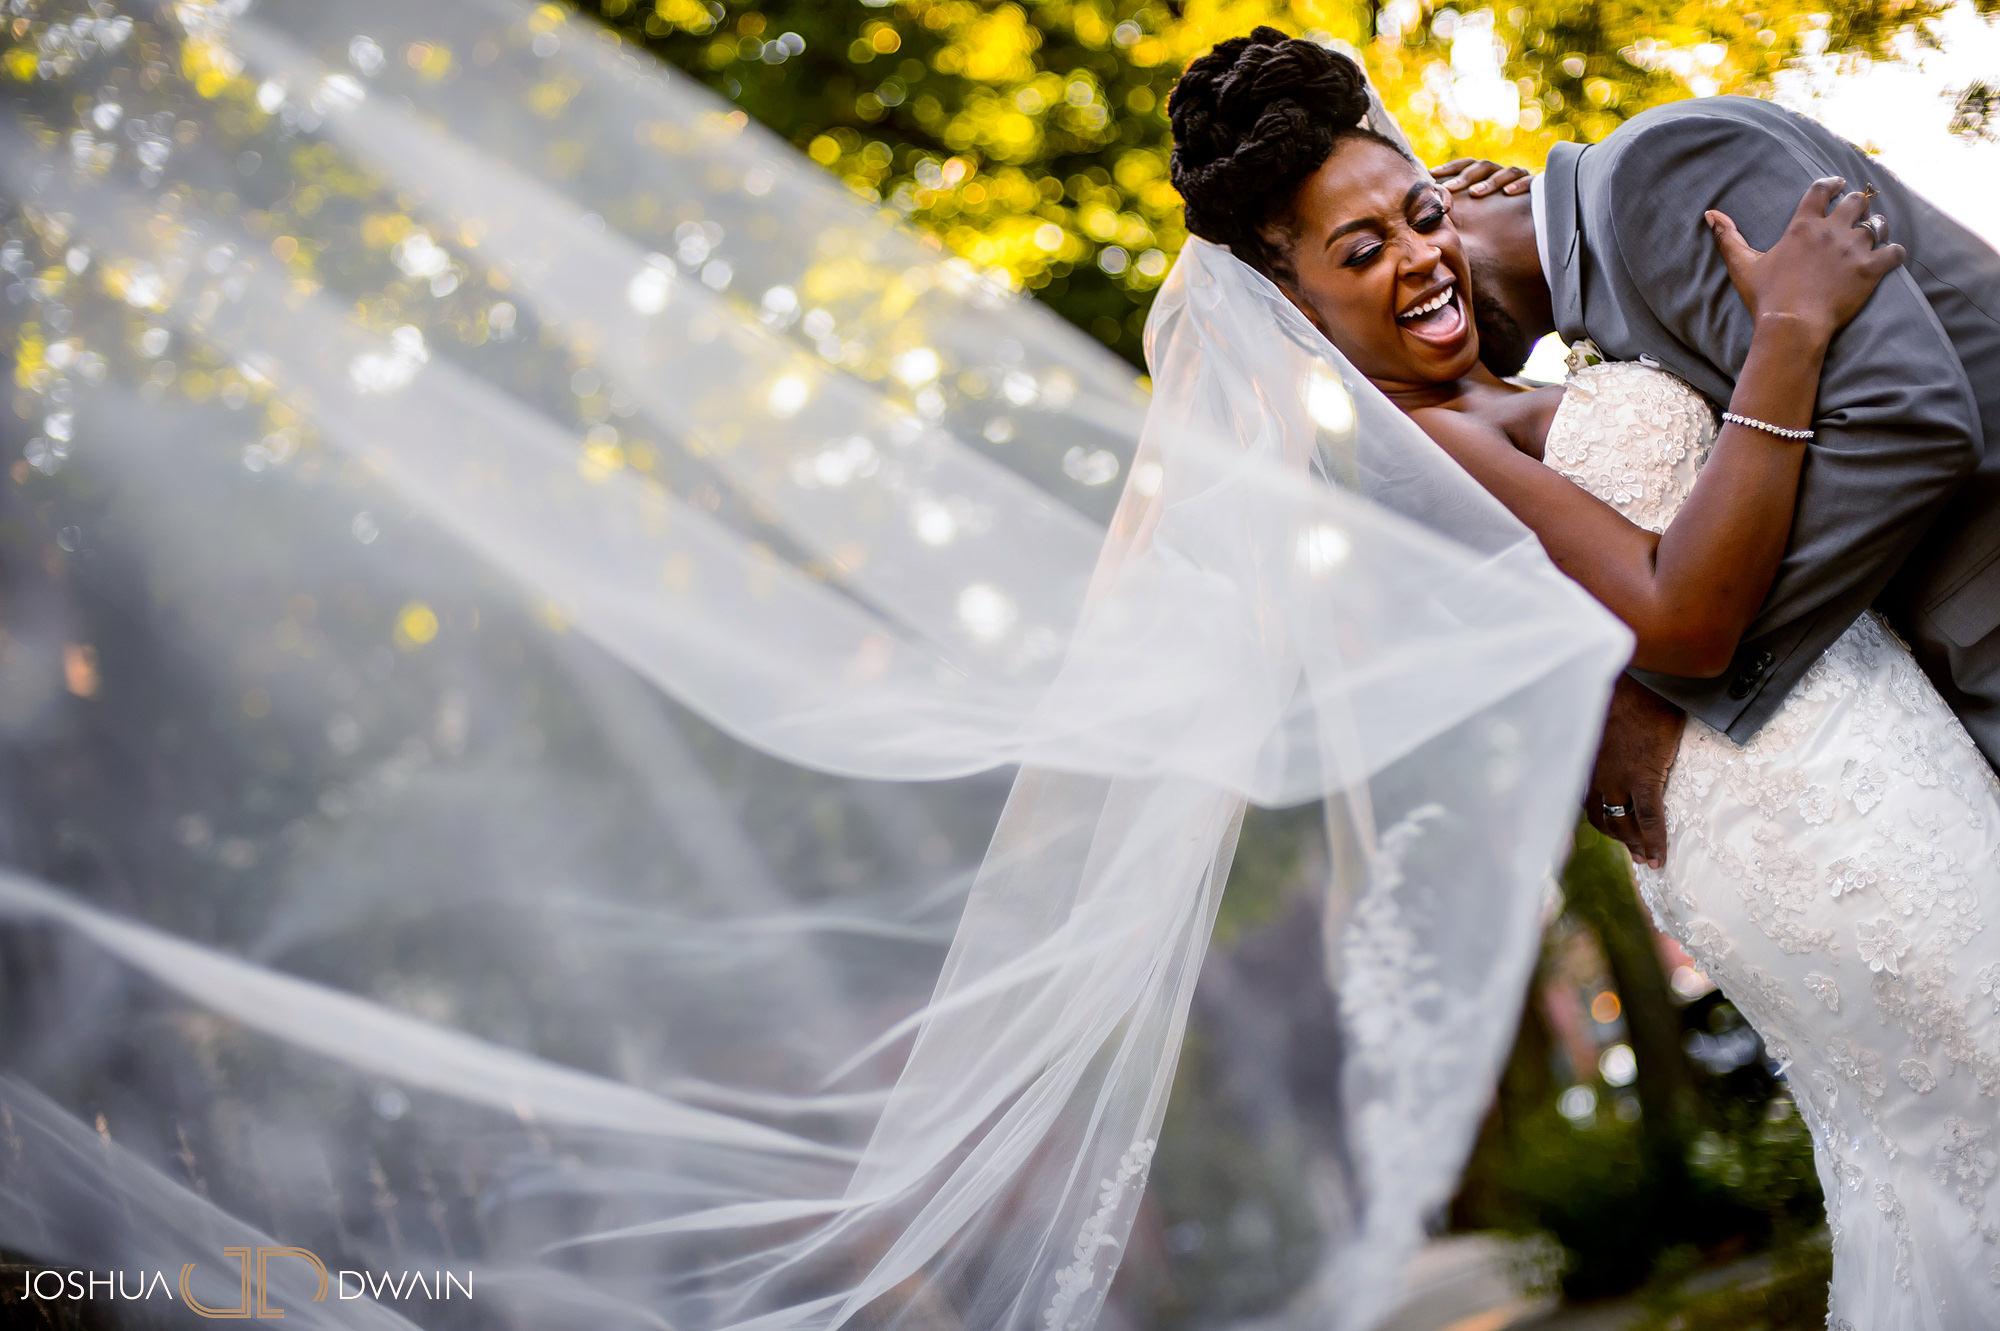 joshua-dwain-weddings-gallery-best-wedding-photographers-us-036